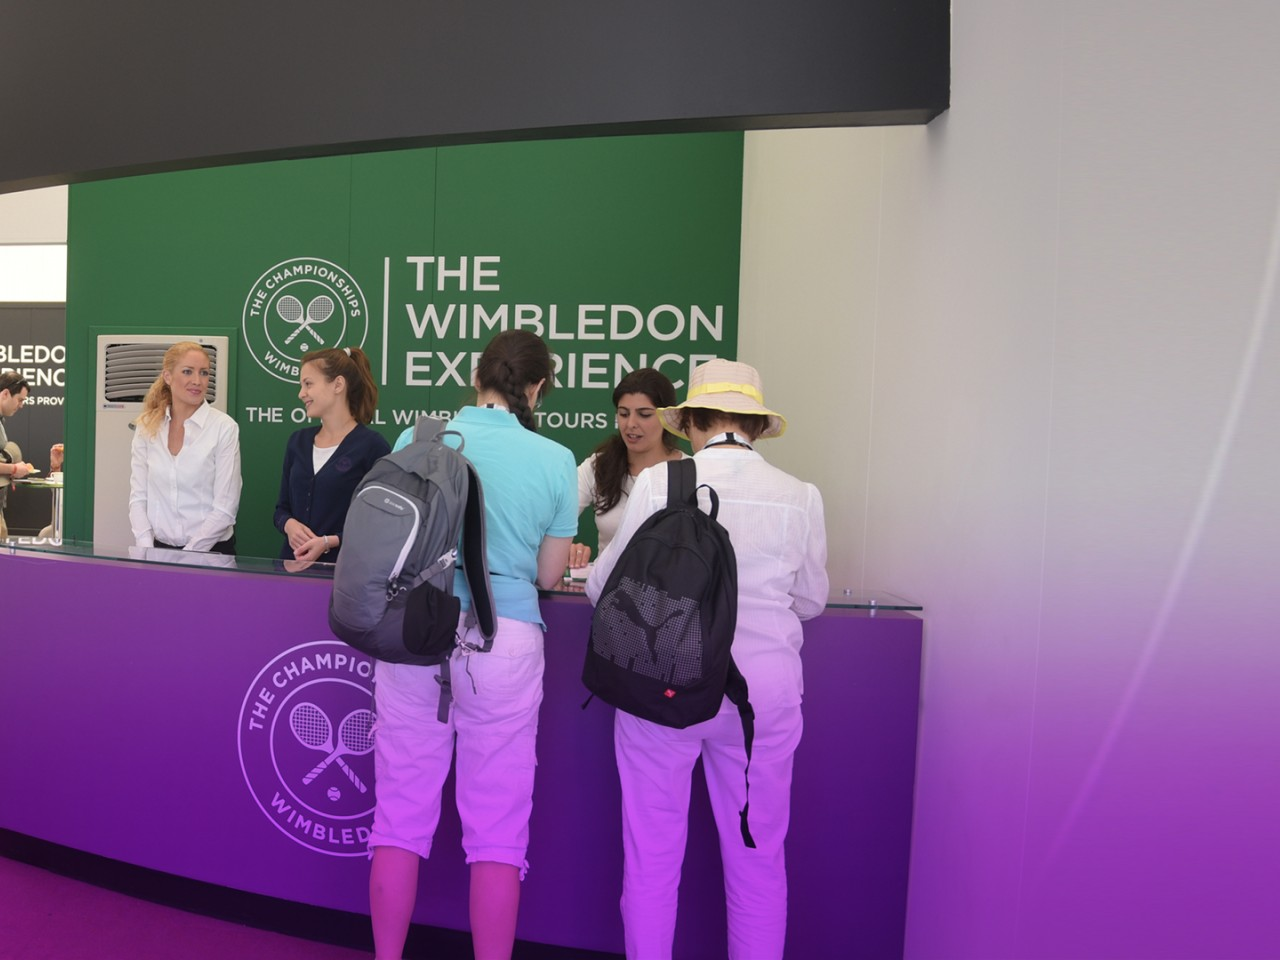 The Wimbledon Semi-Finals Programme